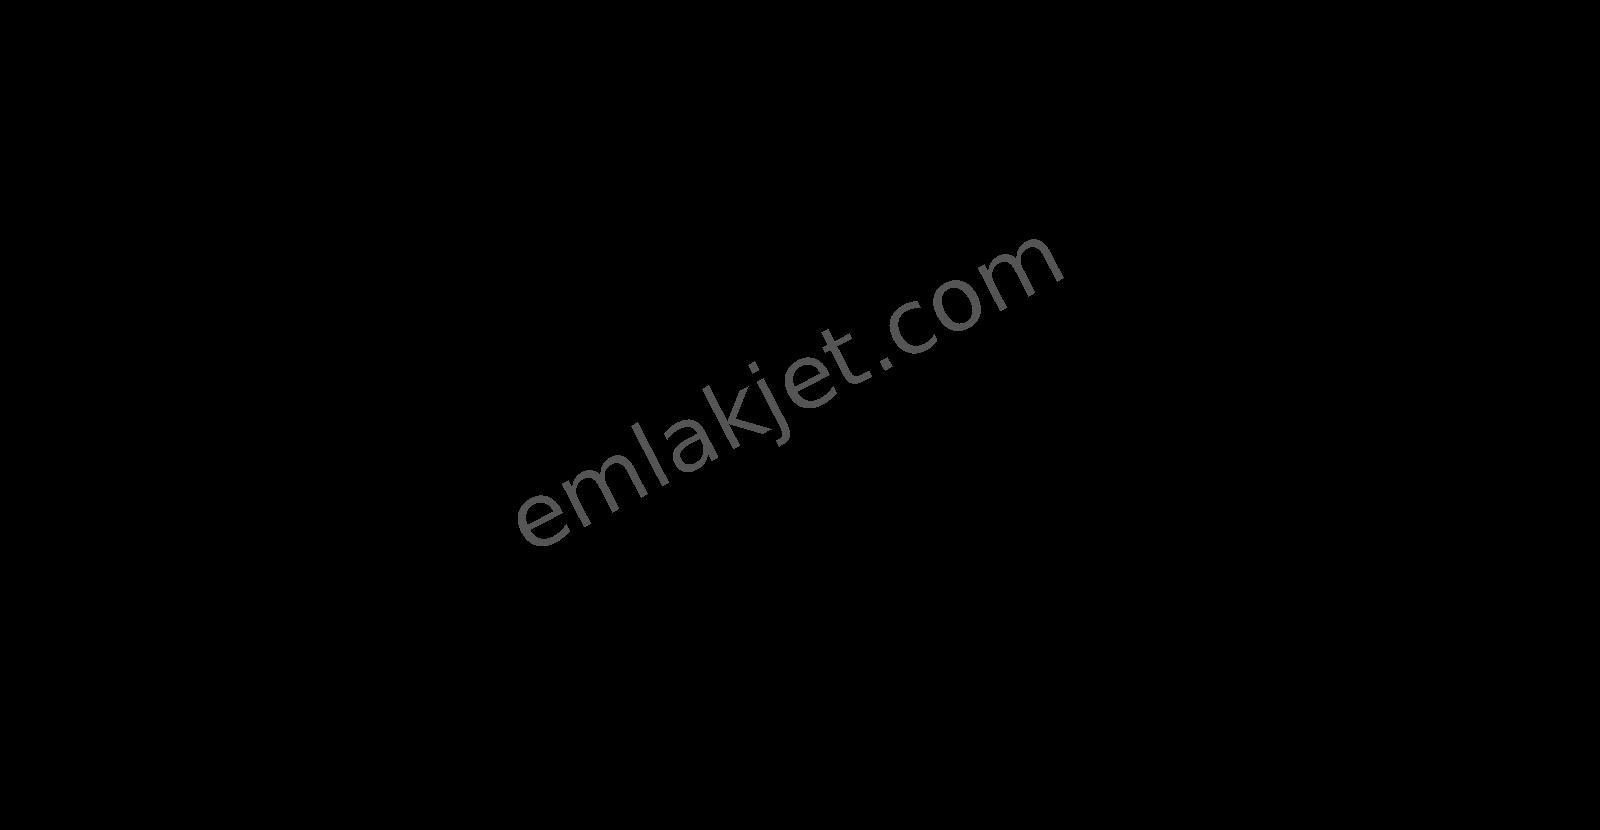 https://imaj.emlakjet.com/listing/9406389/01BBD76537FEC26F5D7C5E25033A07FE9406389.jpg